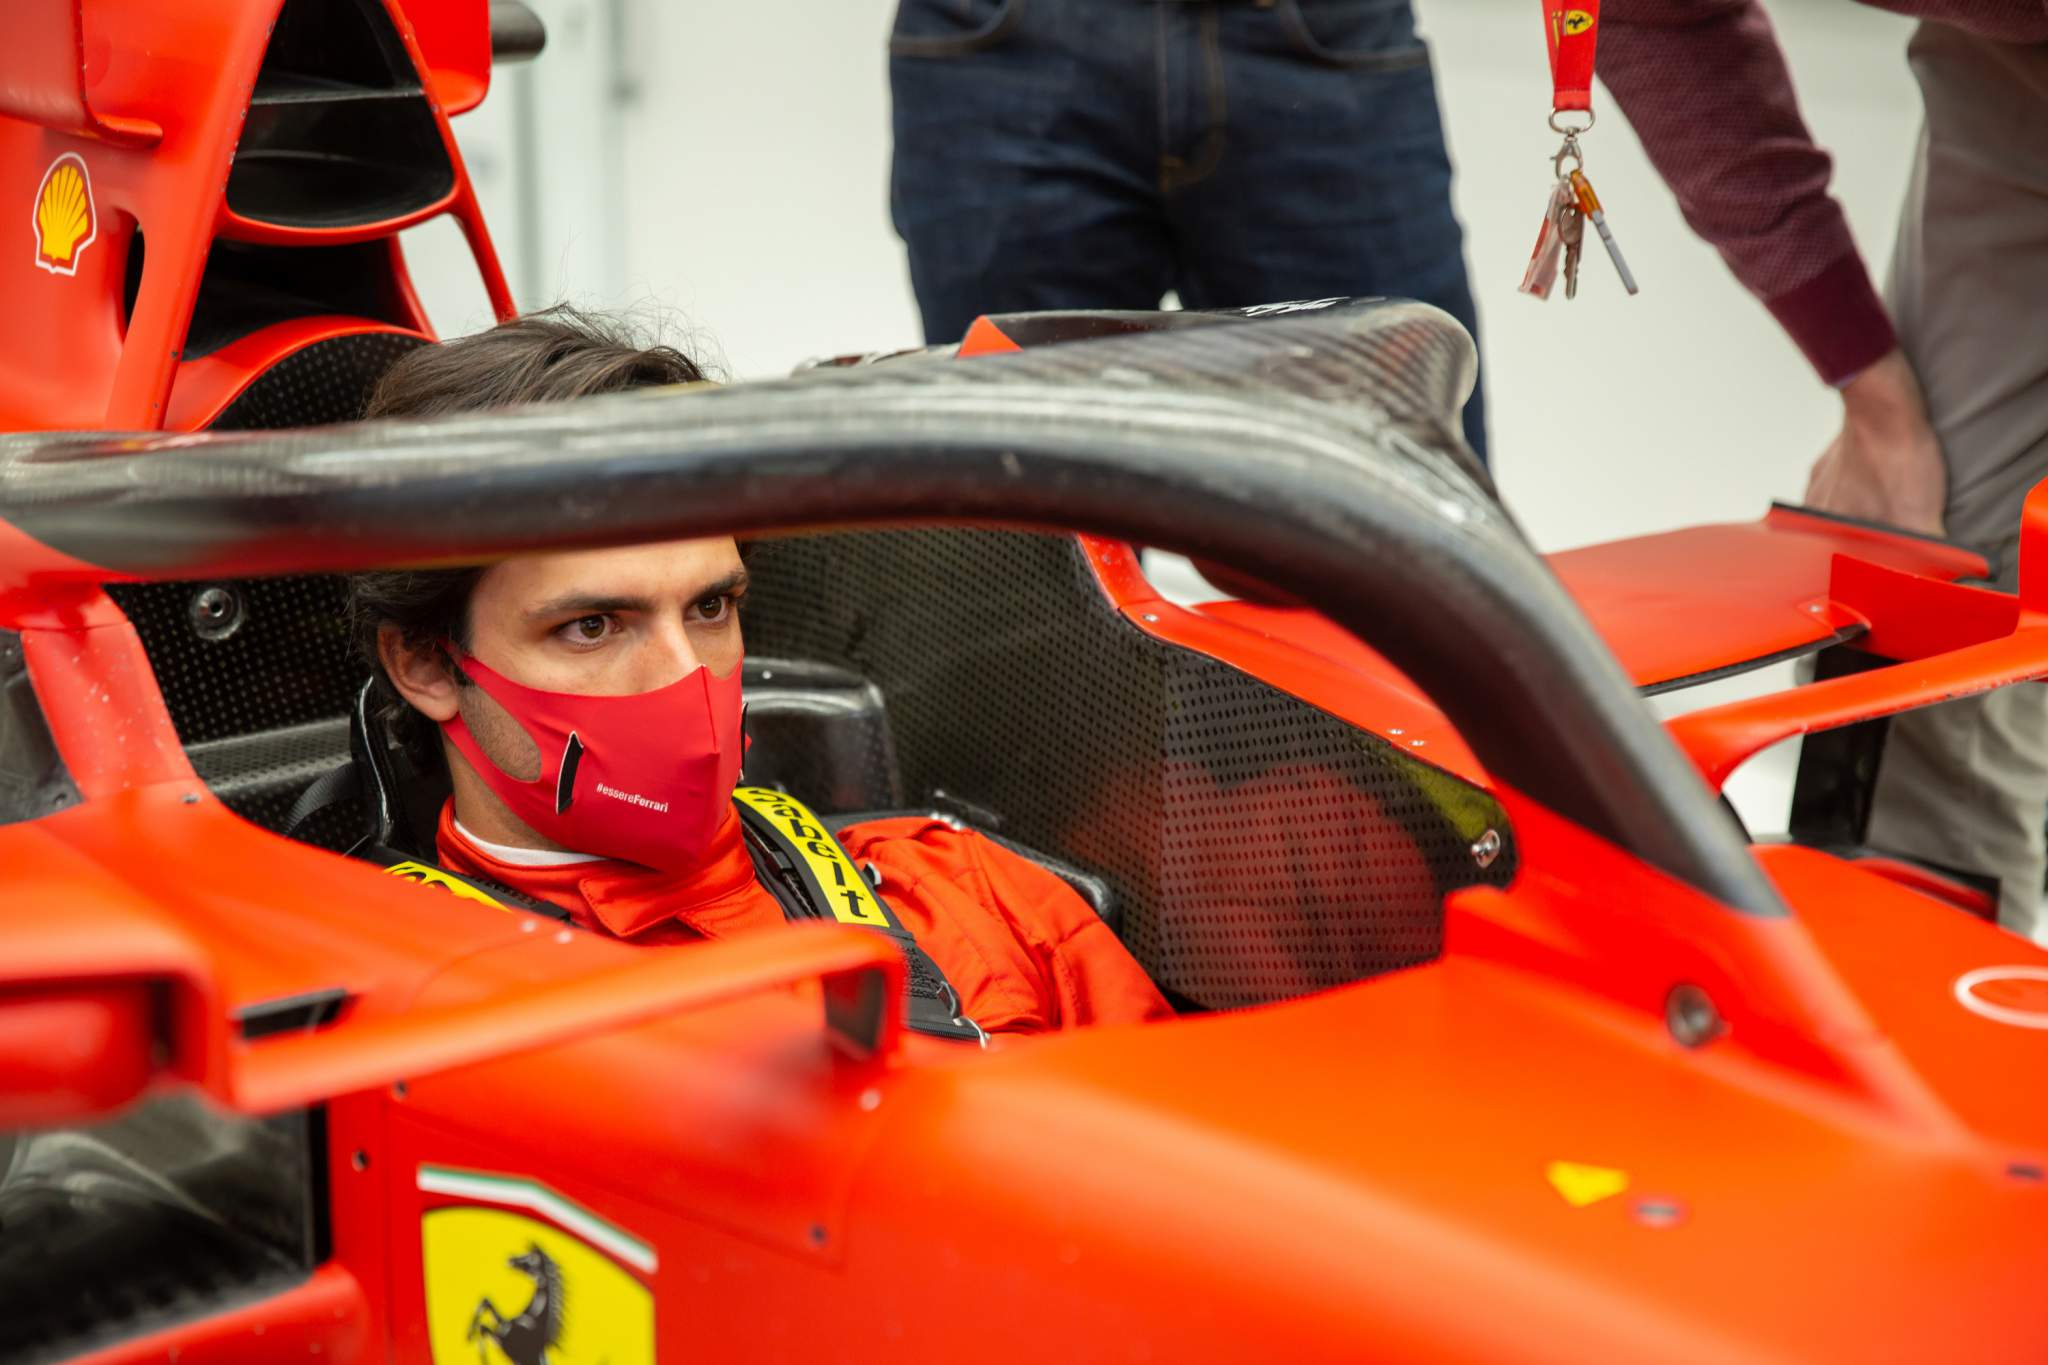 Carlos Sainz Jr Ferrari factory visit seat fit Maranello December 2020